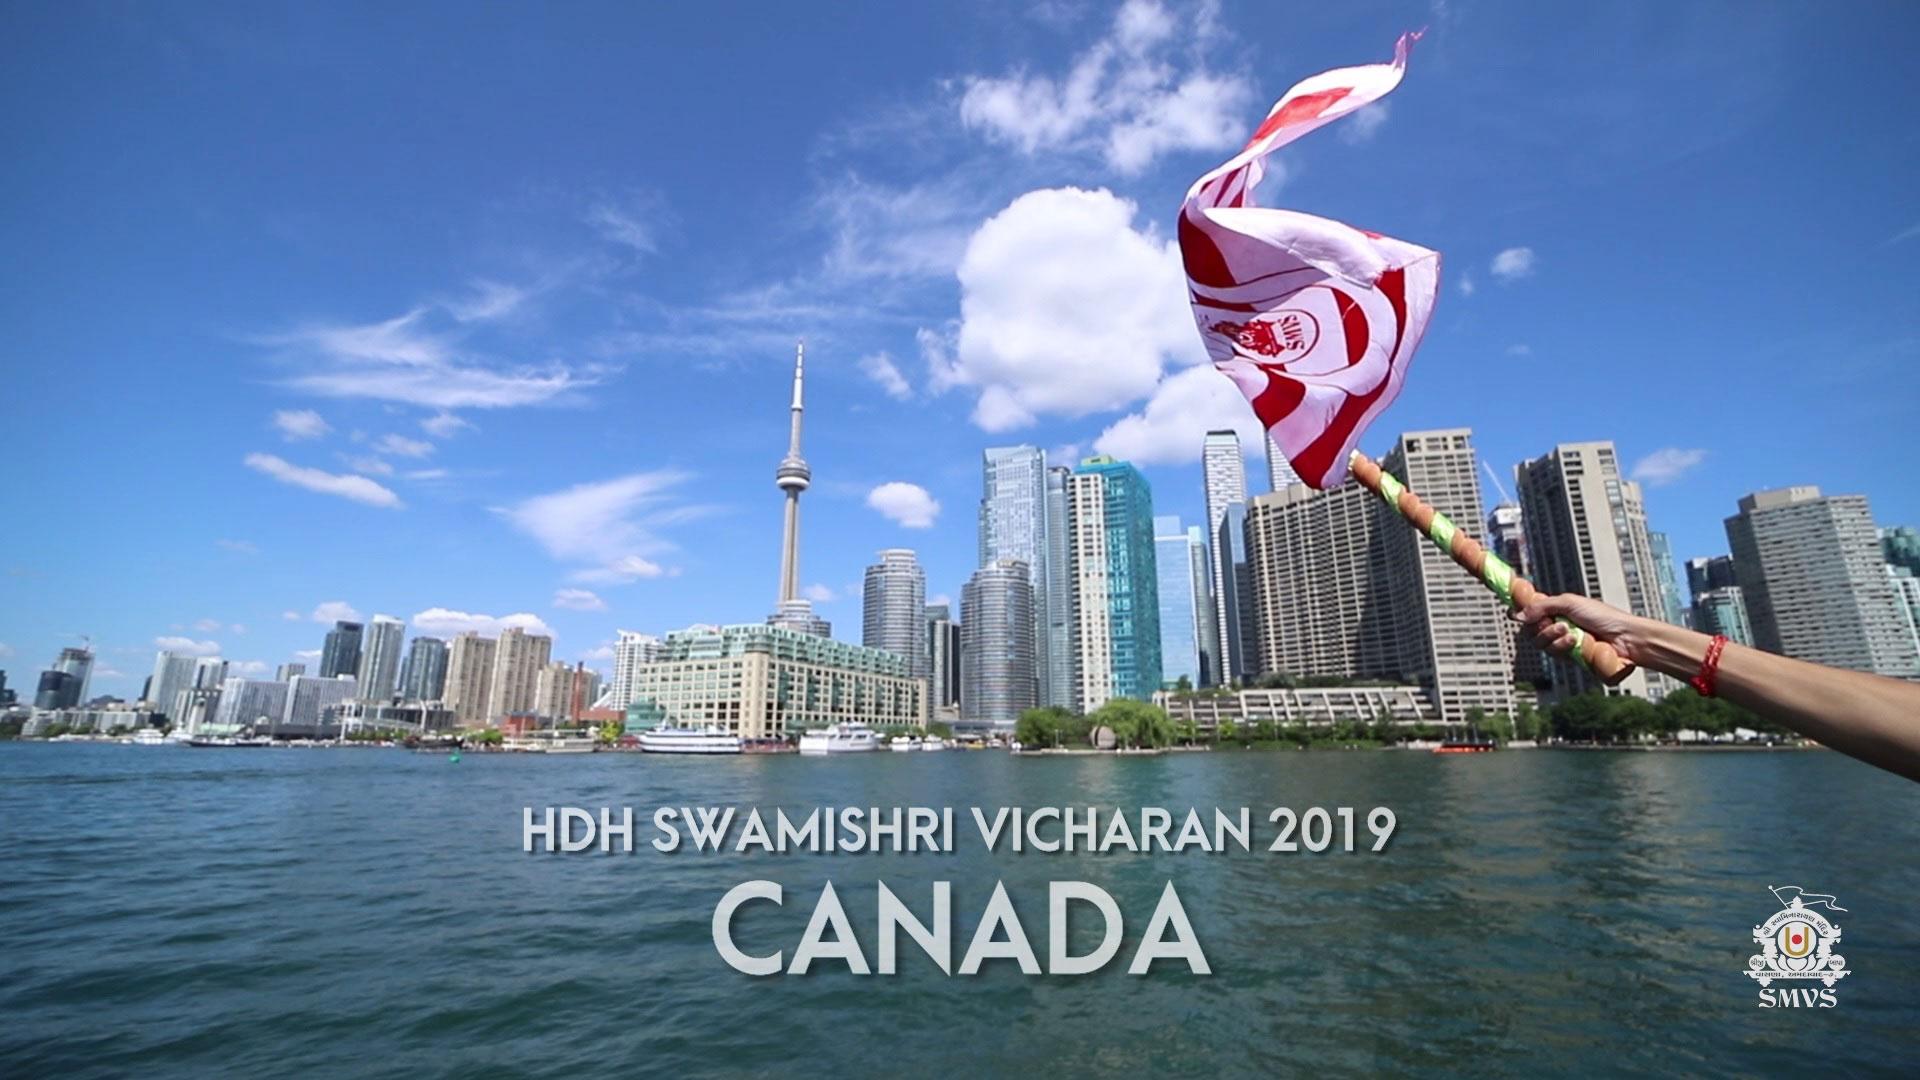 HDH Swamishri Canada Vicharan - 2019